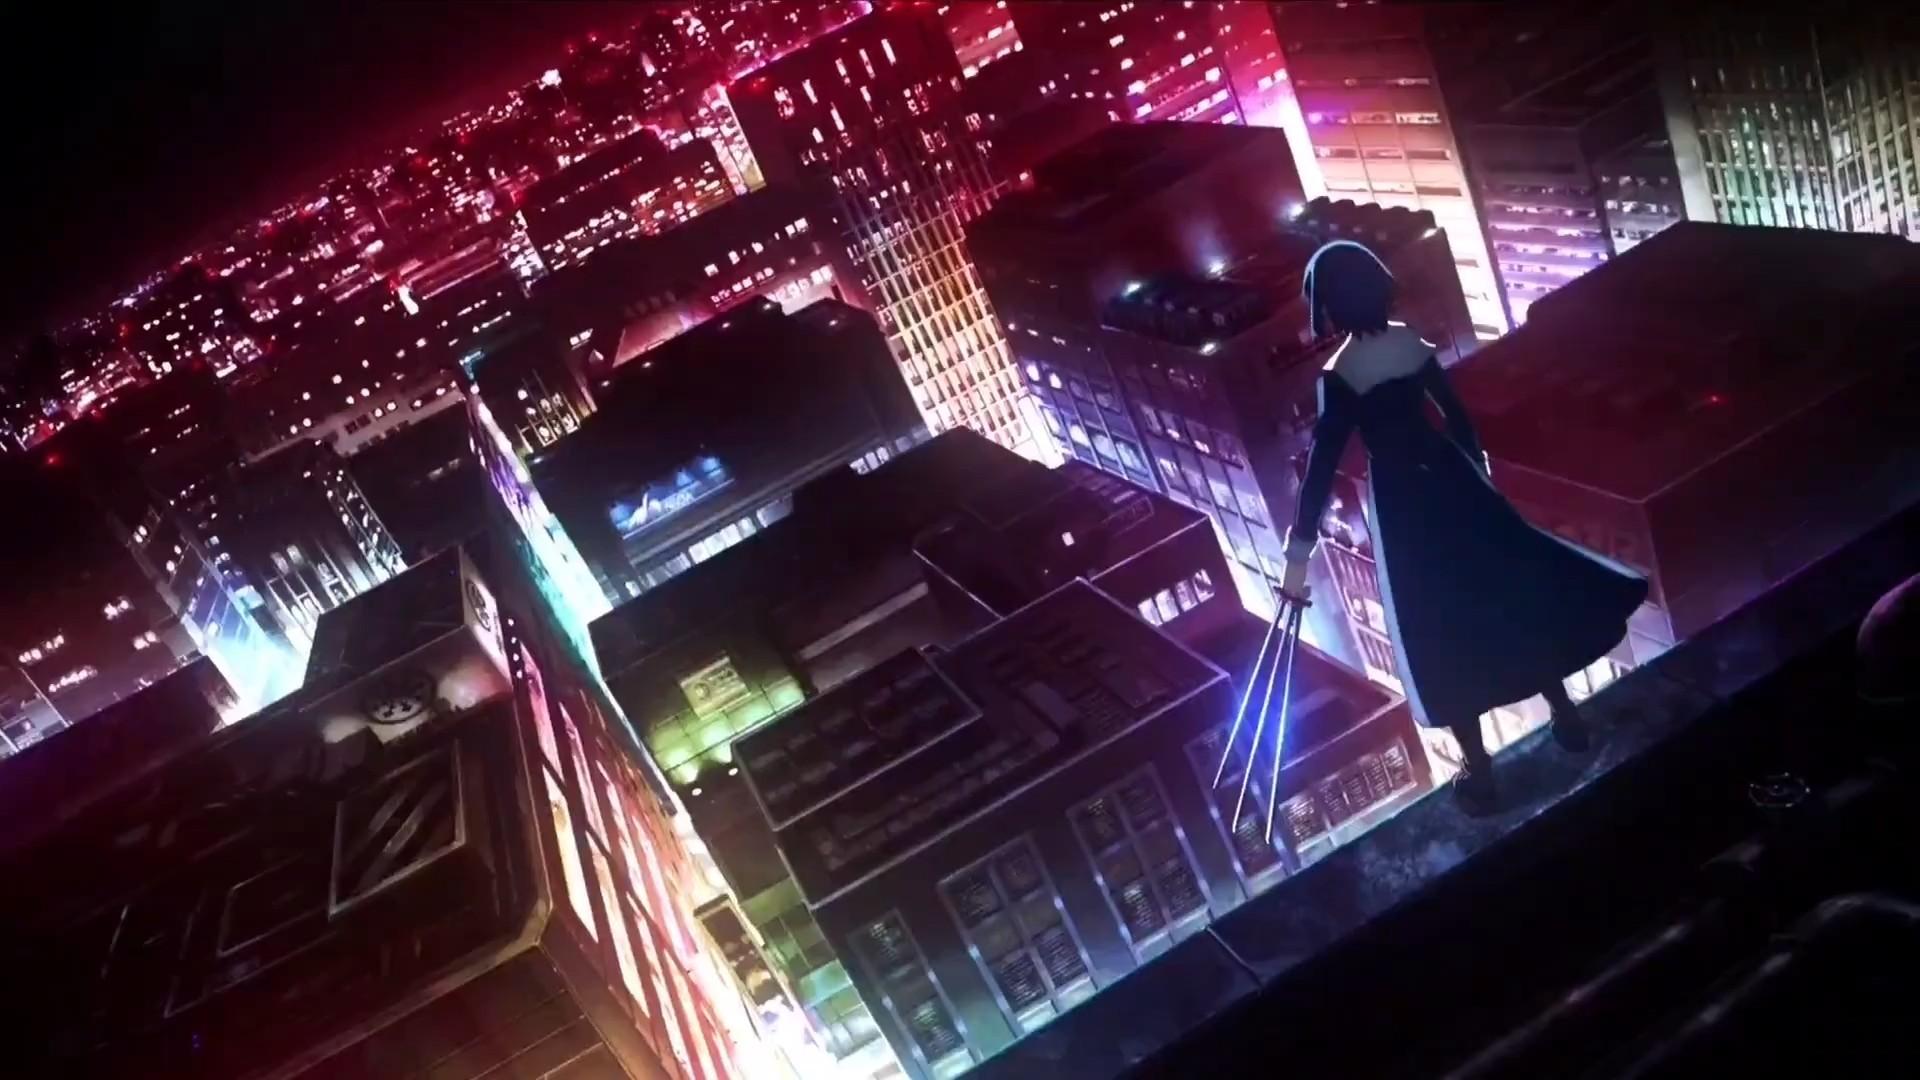 TYPE-MOON《月姫》重制版片头动画公开,B站UP主自制动画《魔法使之夜》发布-